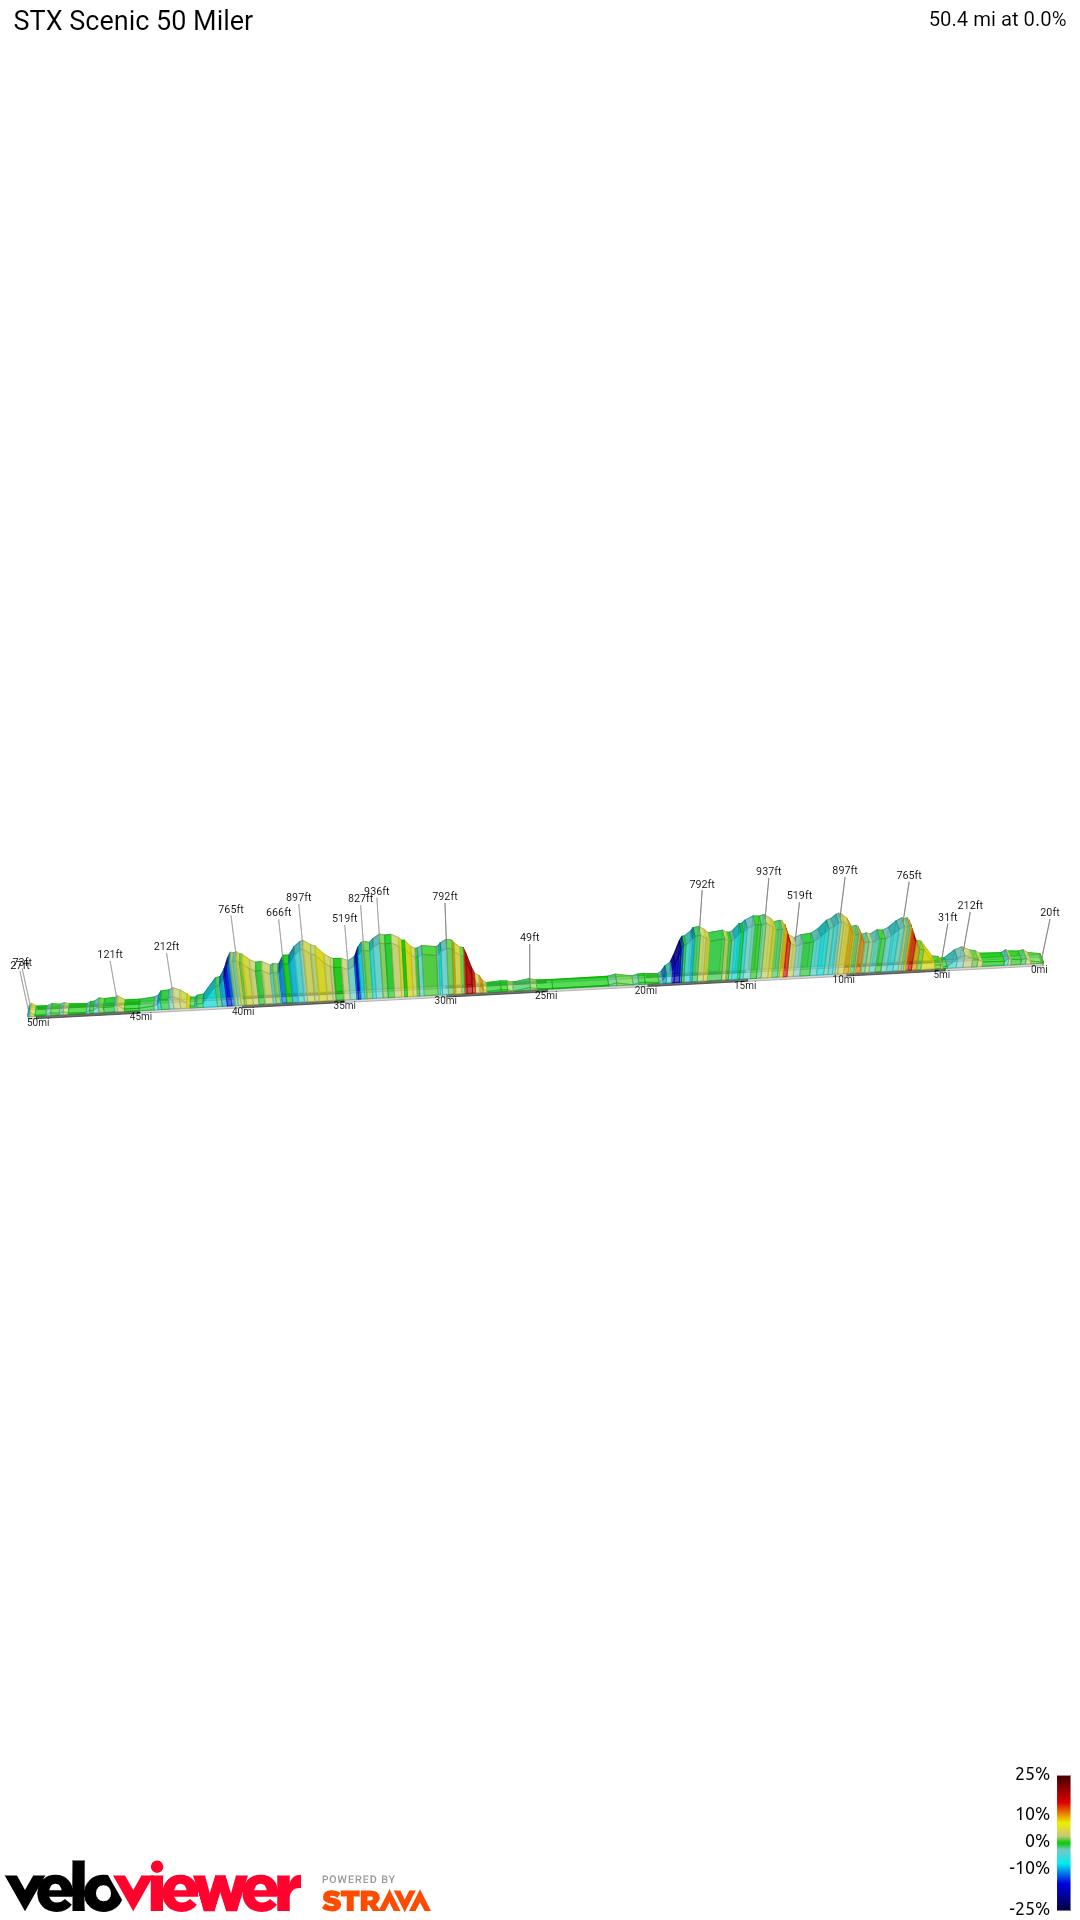 2D Elevation profile image for STX Scenic 50 Miler